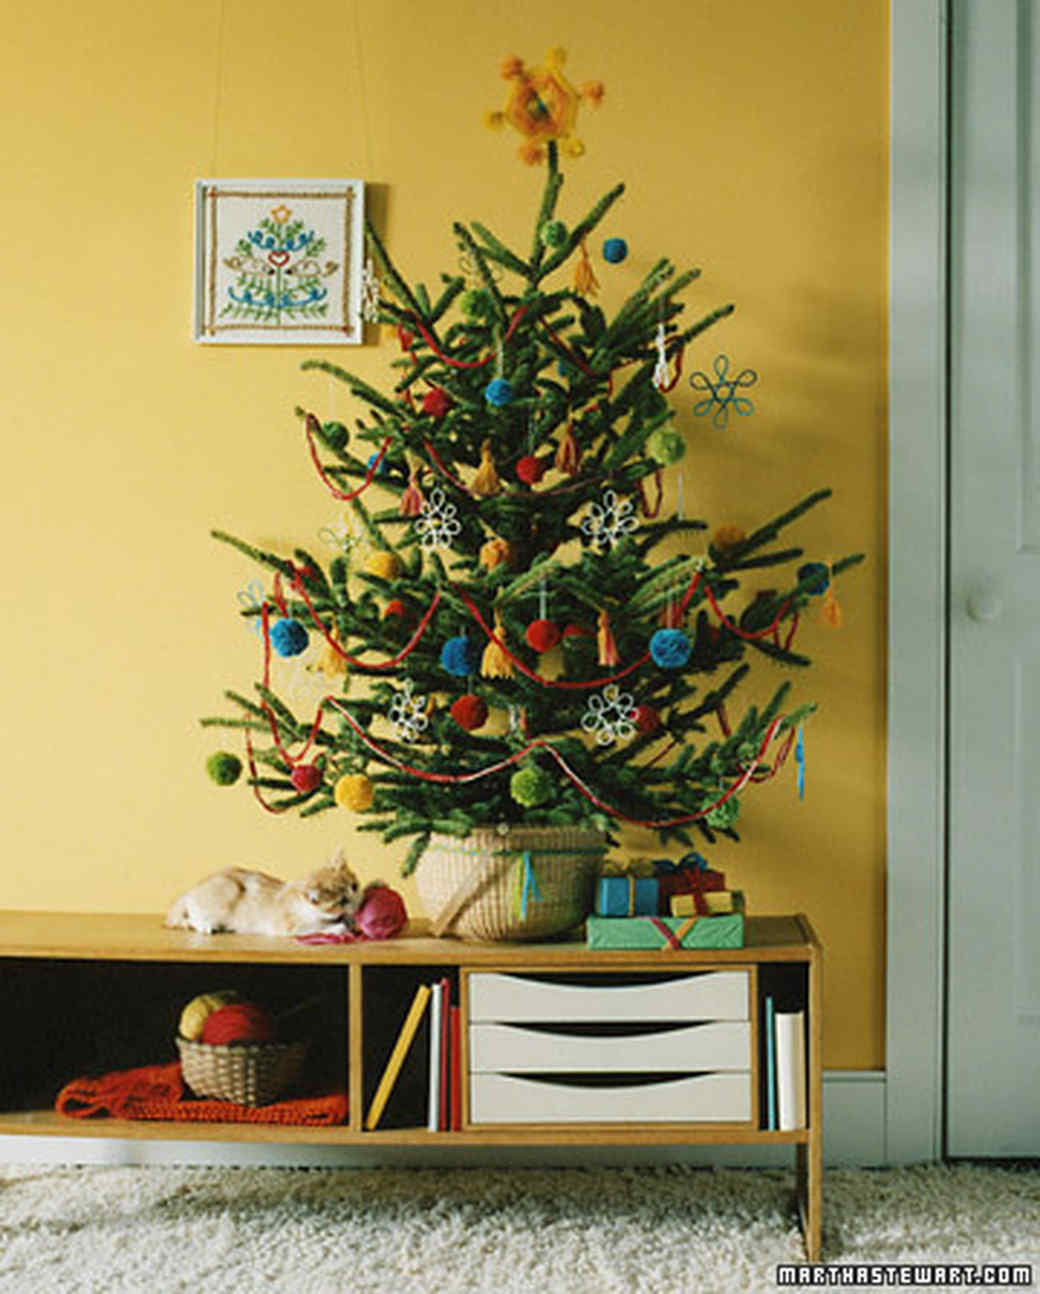 Four Homemade Trees: Yarn